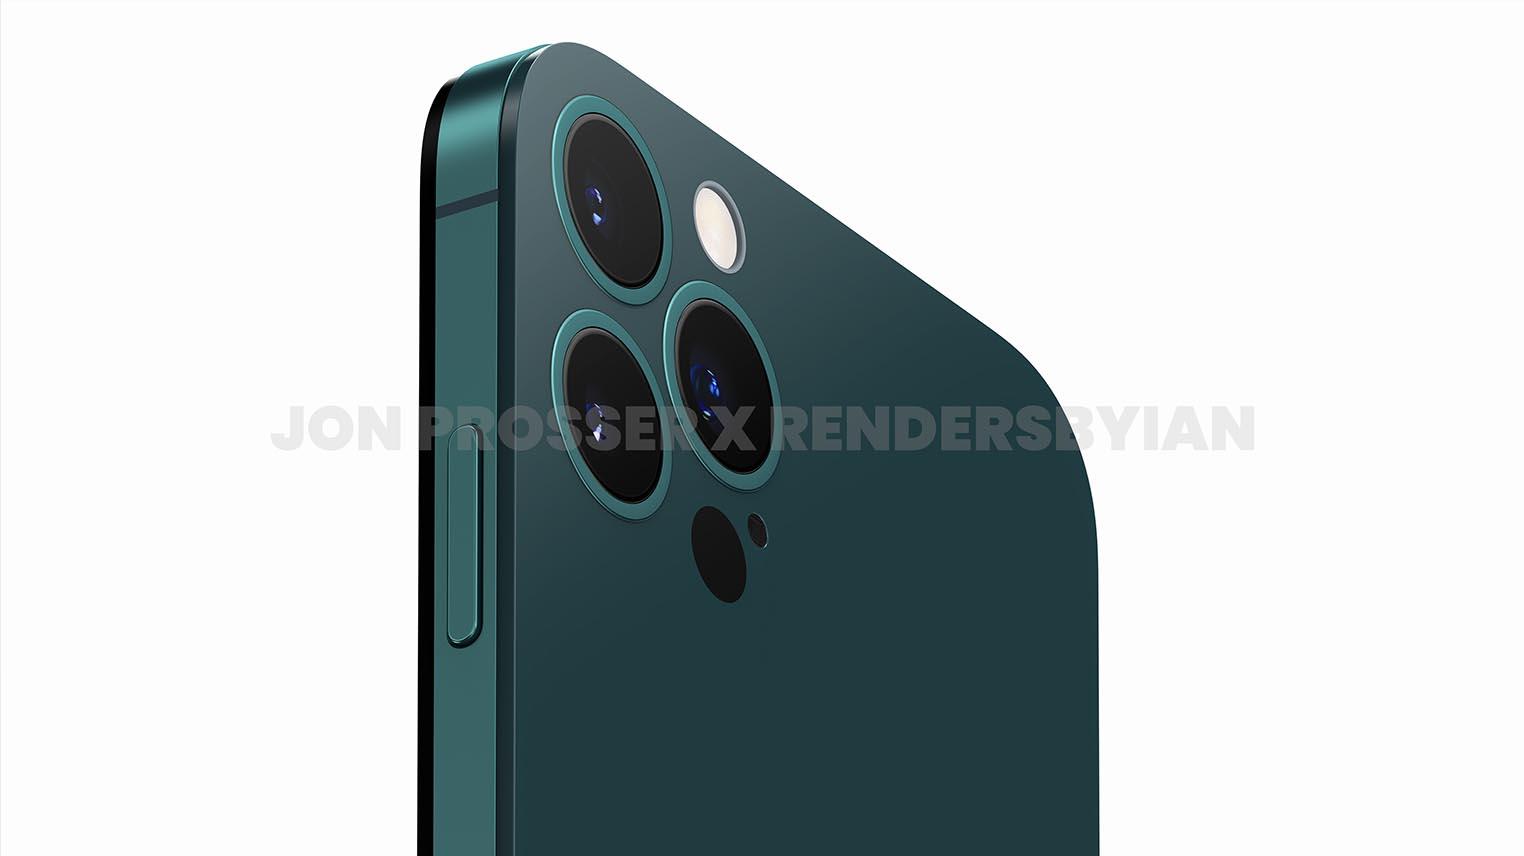 Concept iPhone 14